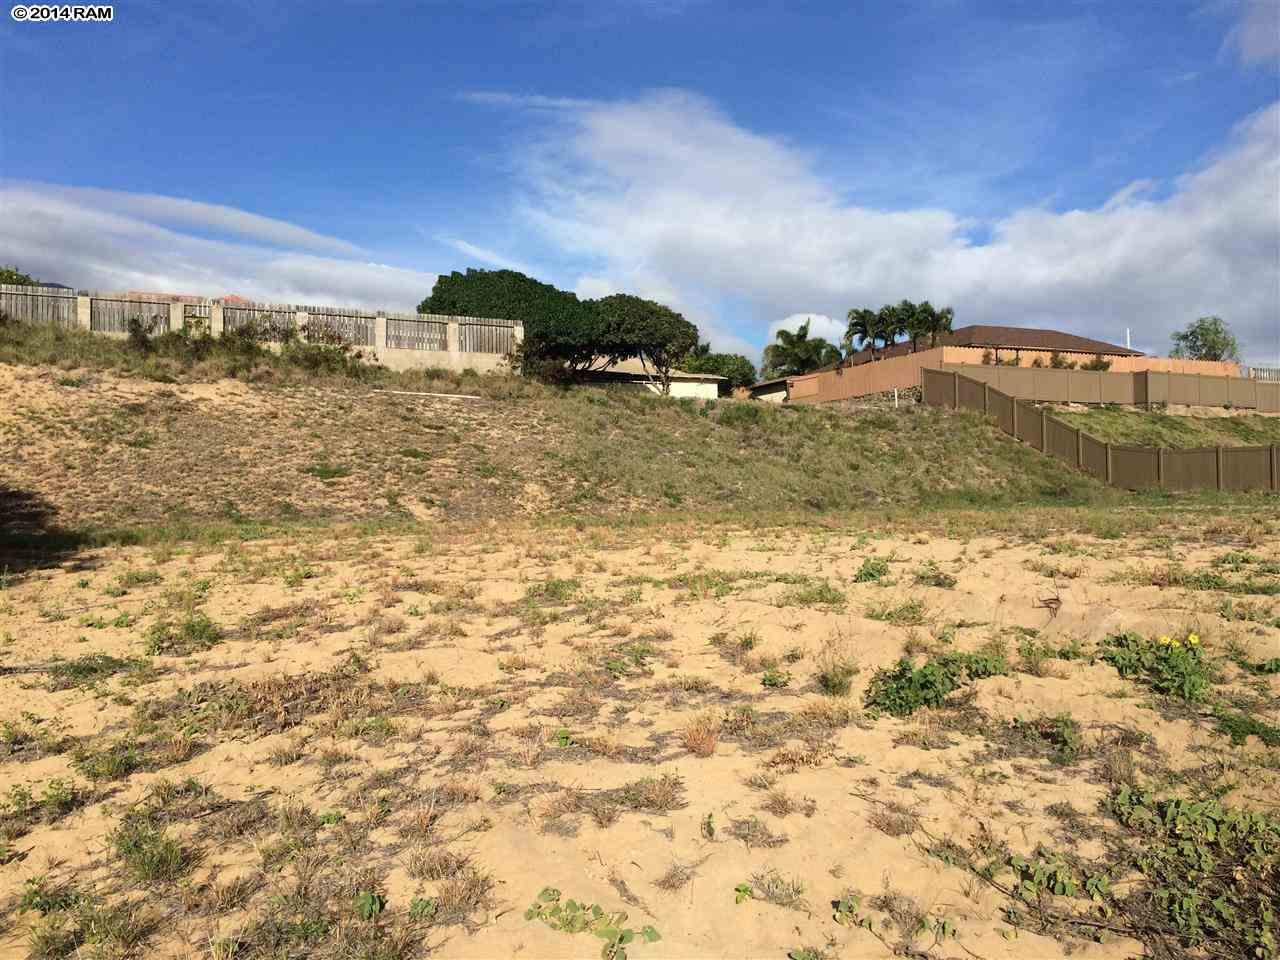 68 Keoneloa St Lot 31 Wailuku, Hi 96793 vacant land - photo 3 of 8